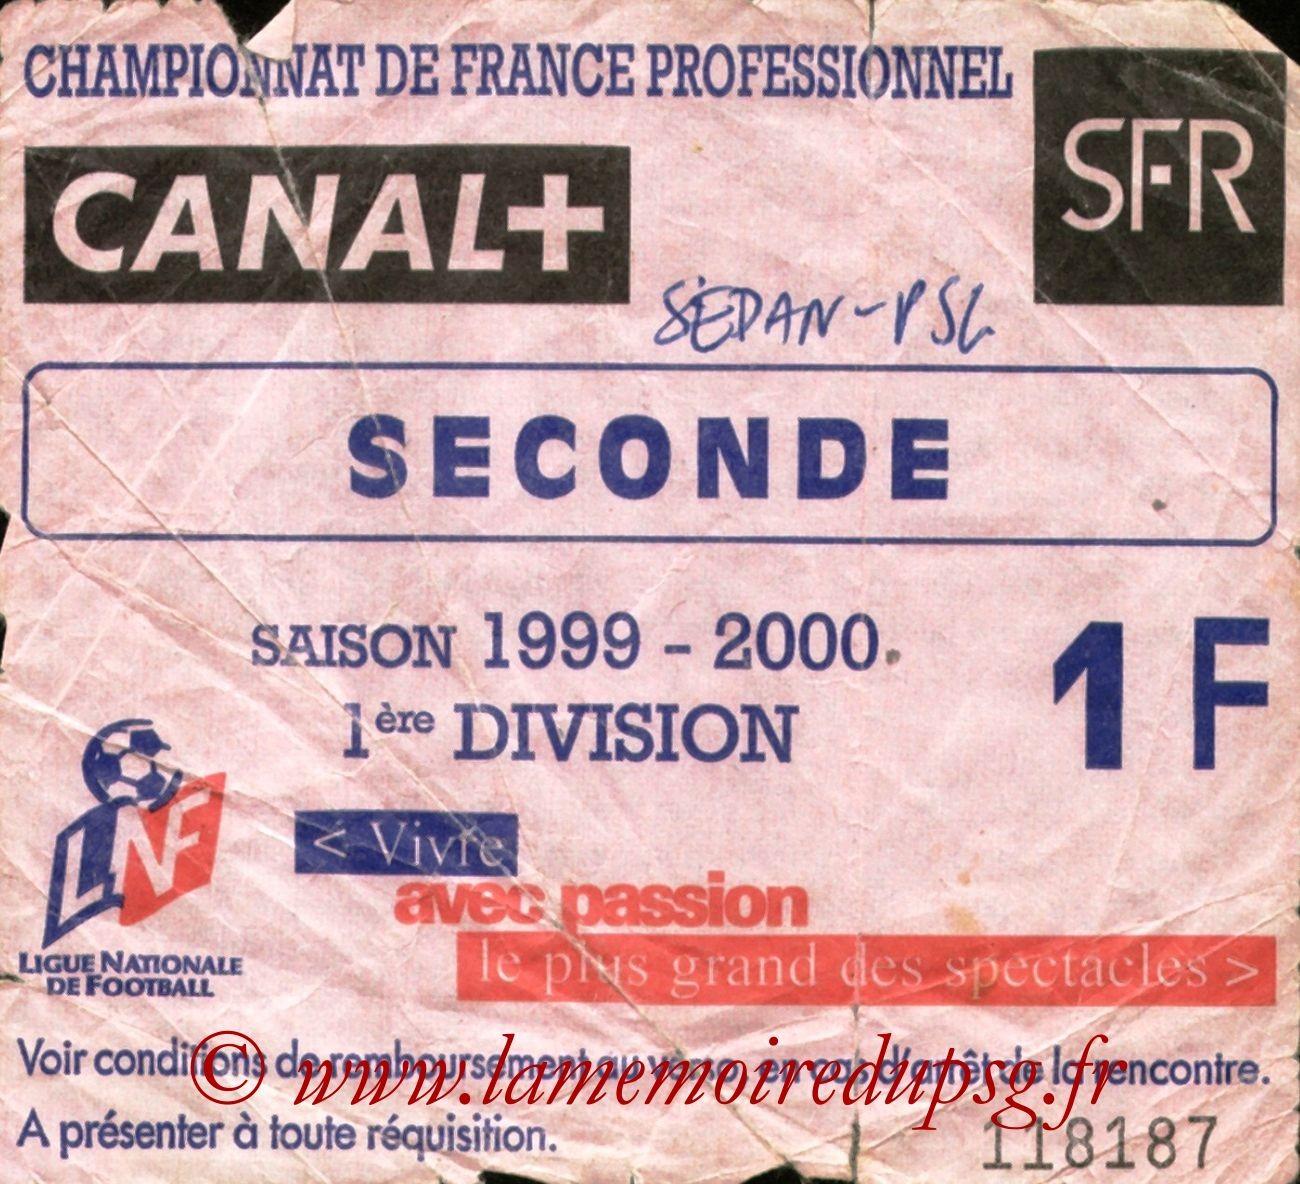 2000-03-11  Sedan-PSG (28ème D1, Sans nom)